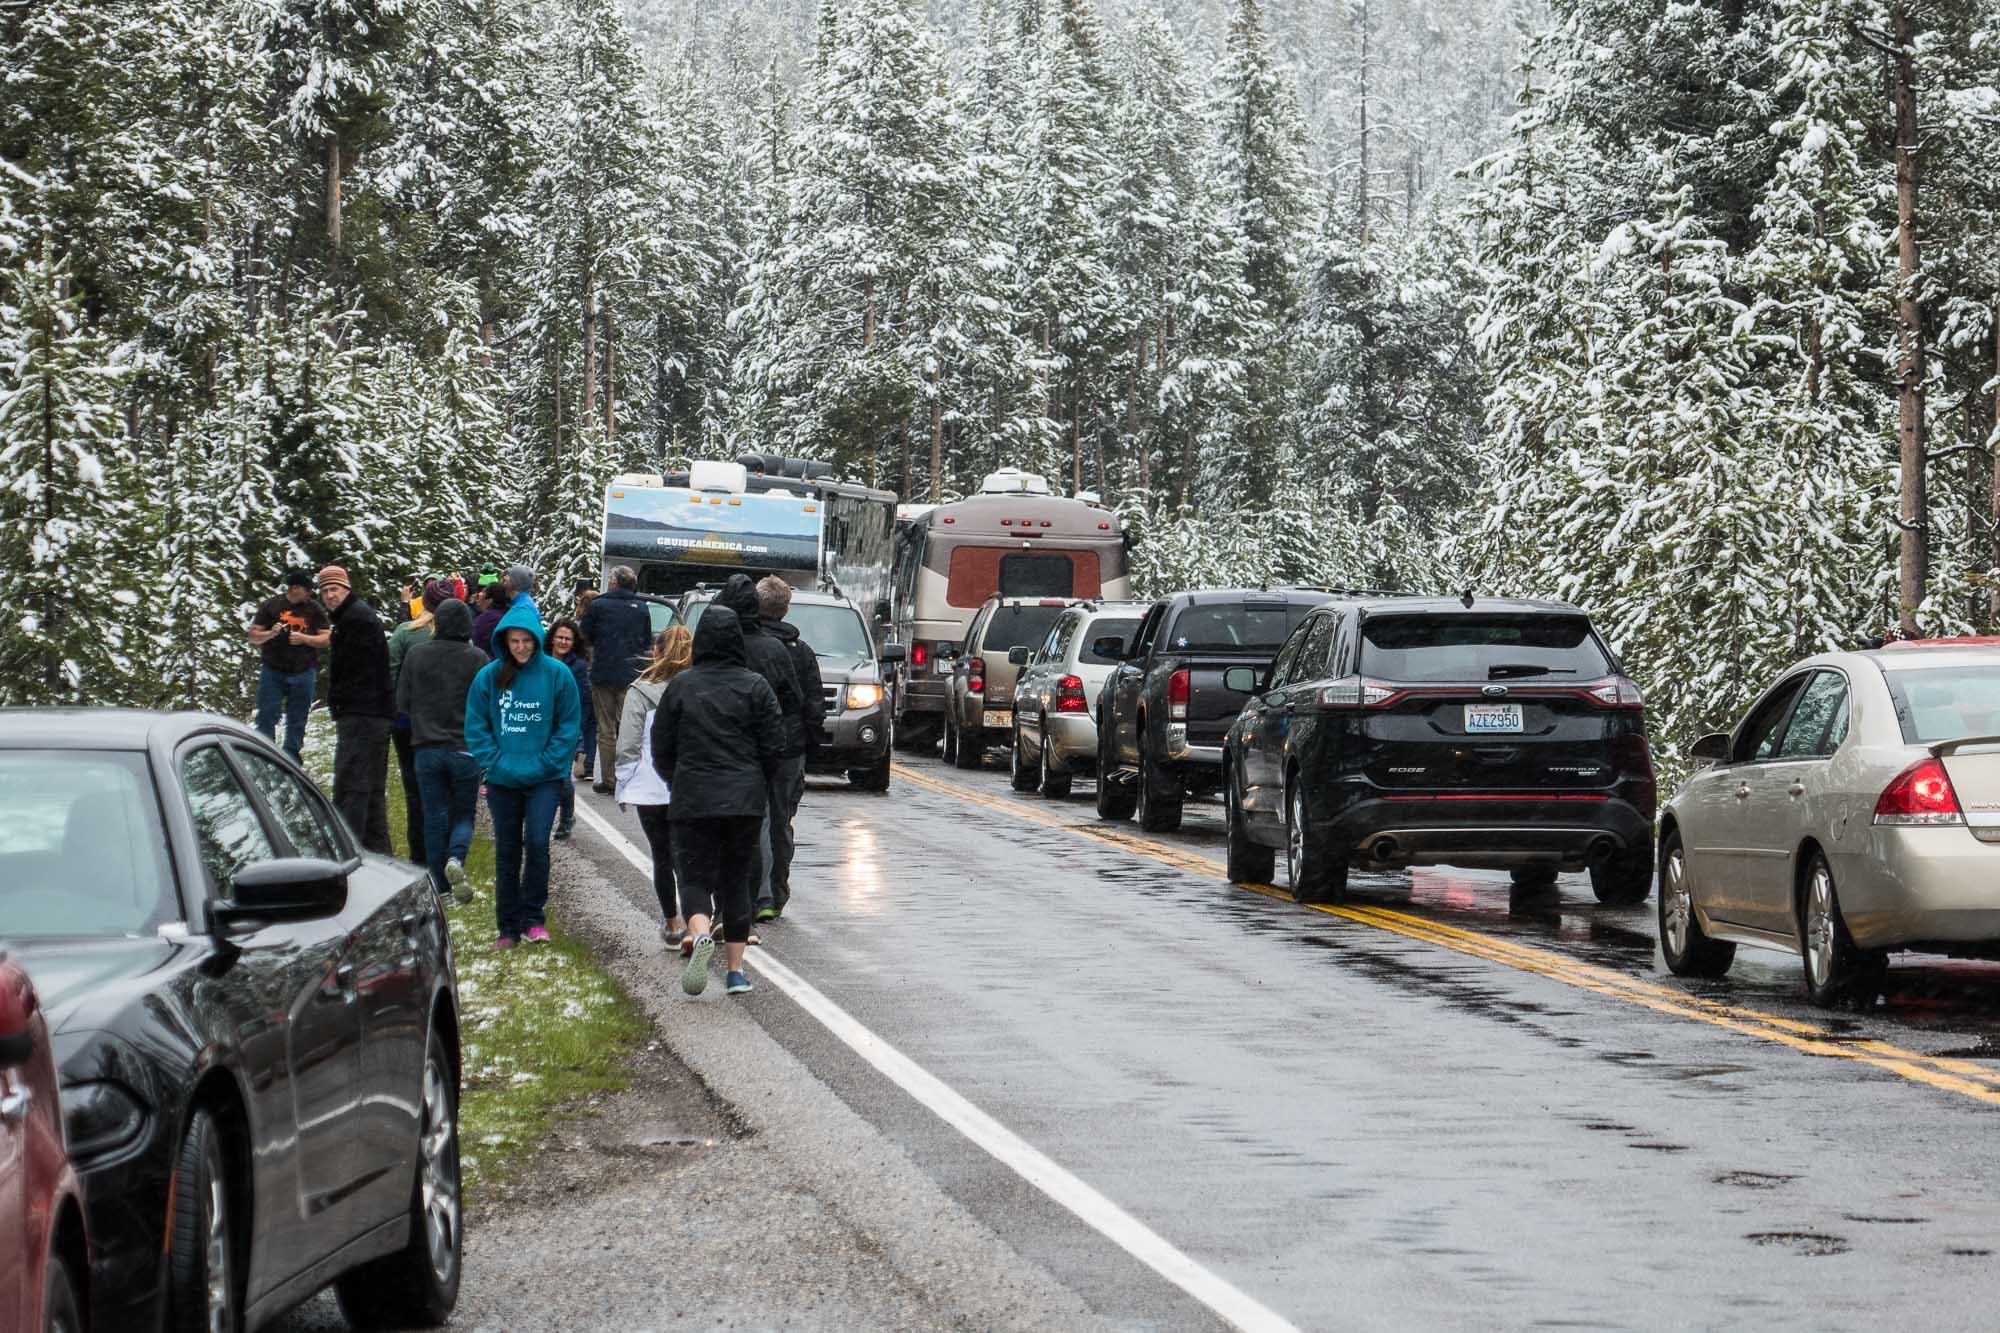 Bears in trees cause big traffic jams!